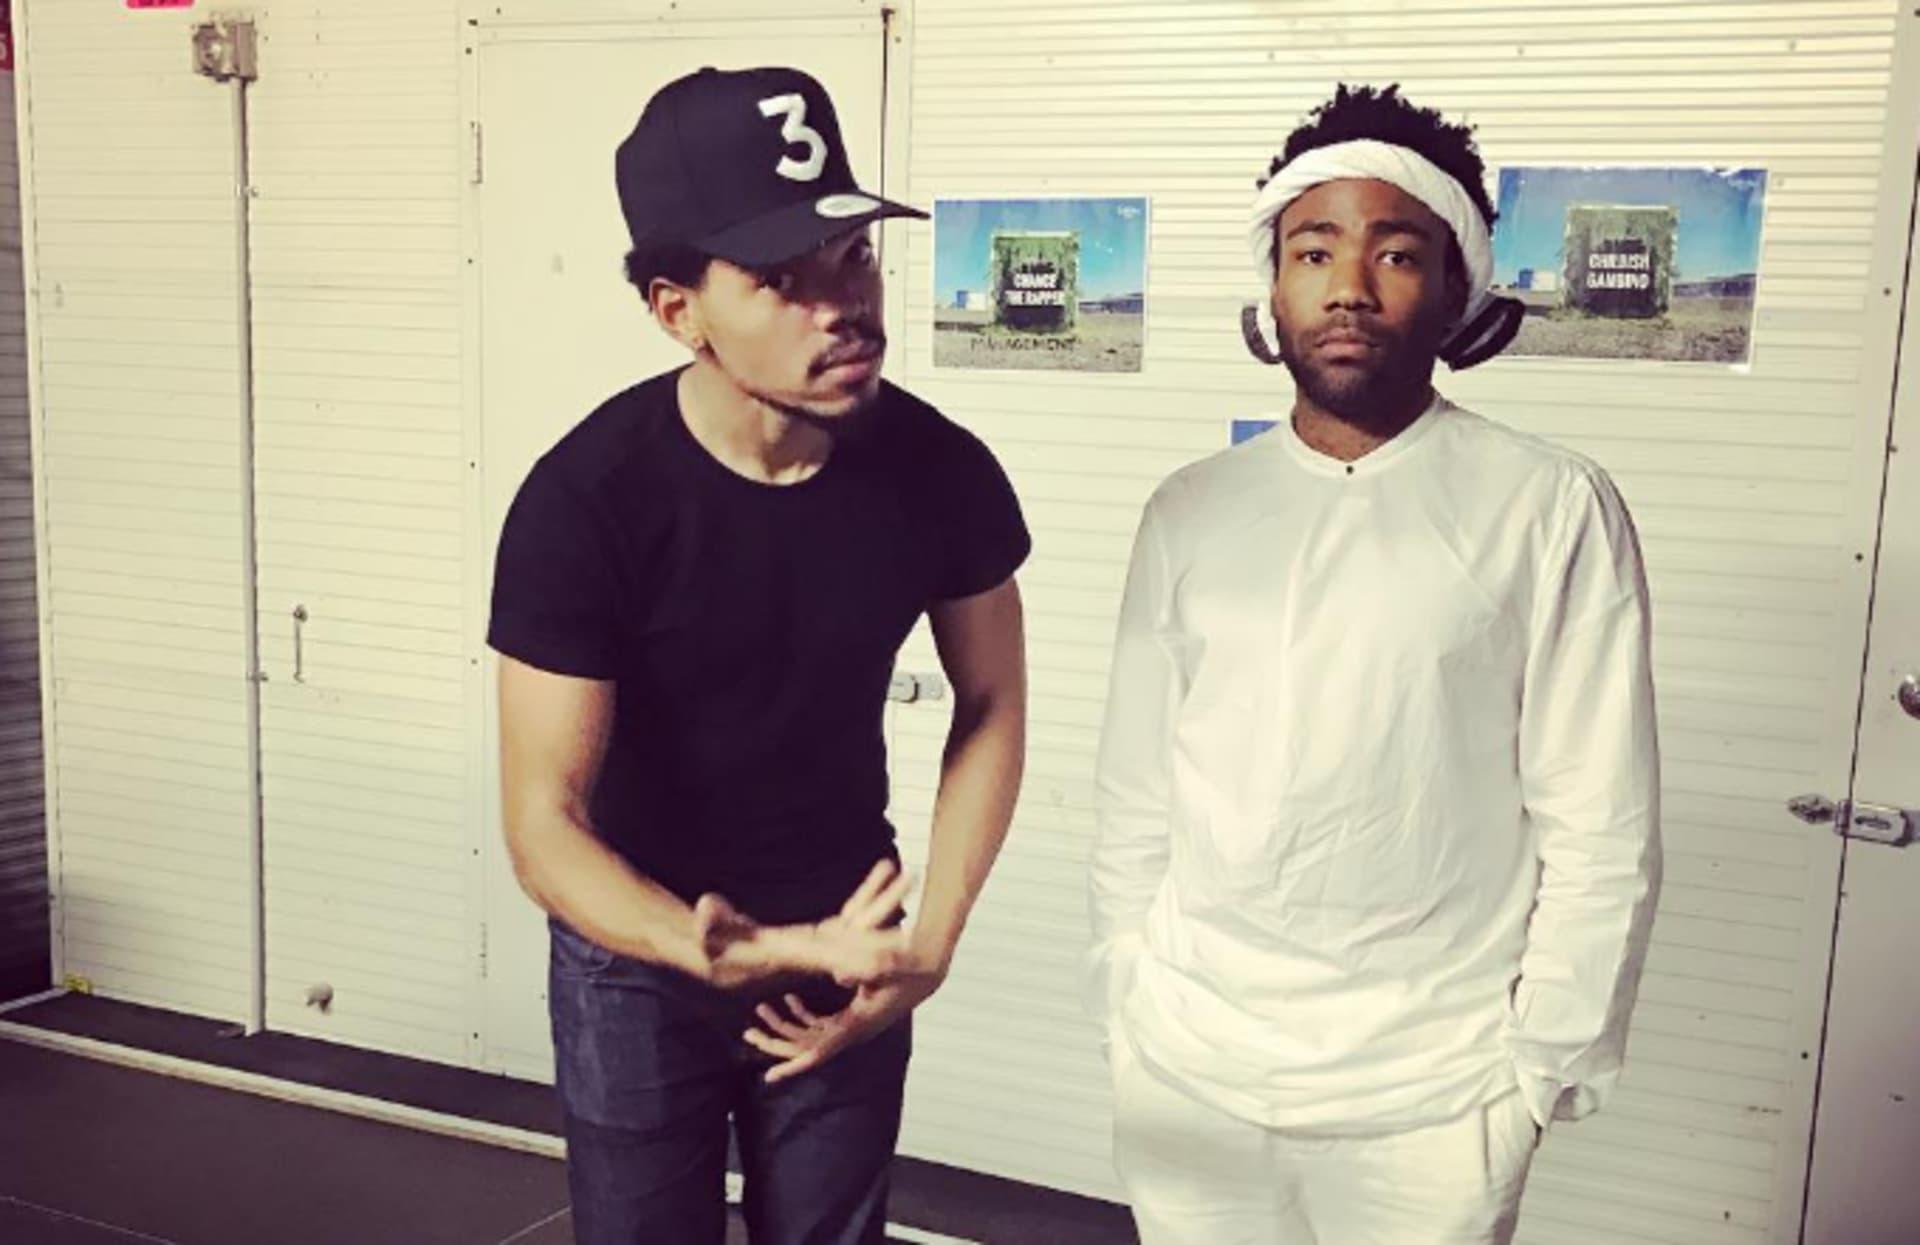 Chance the Rapper and Childish Gambino